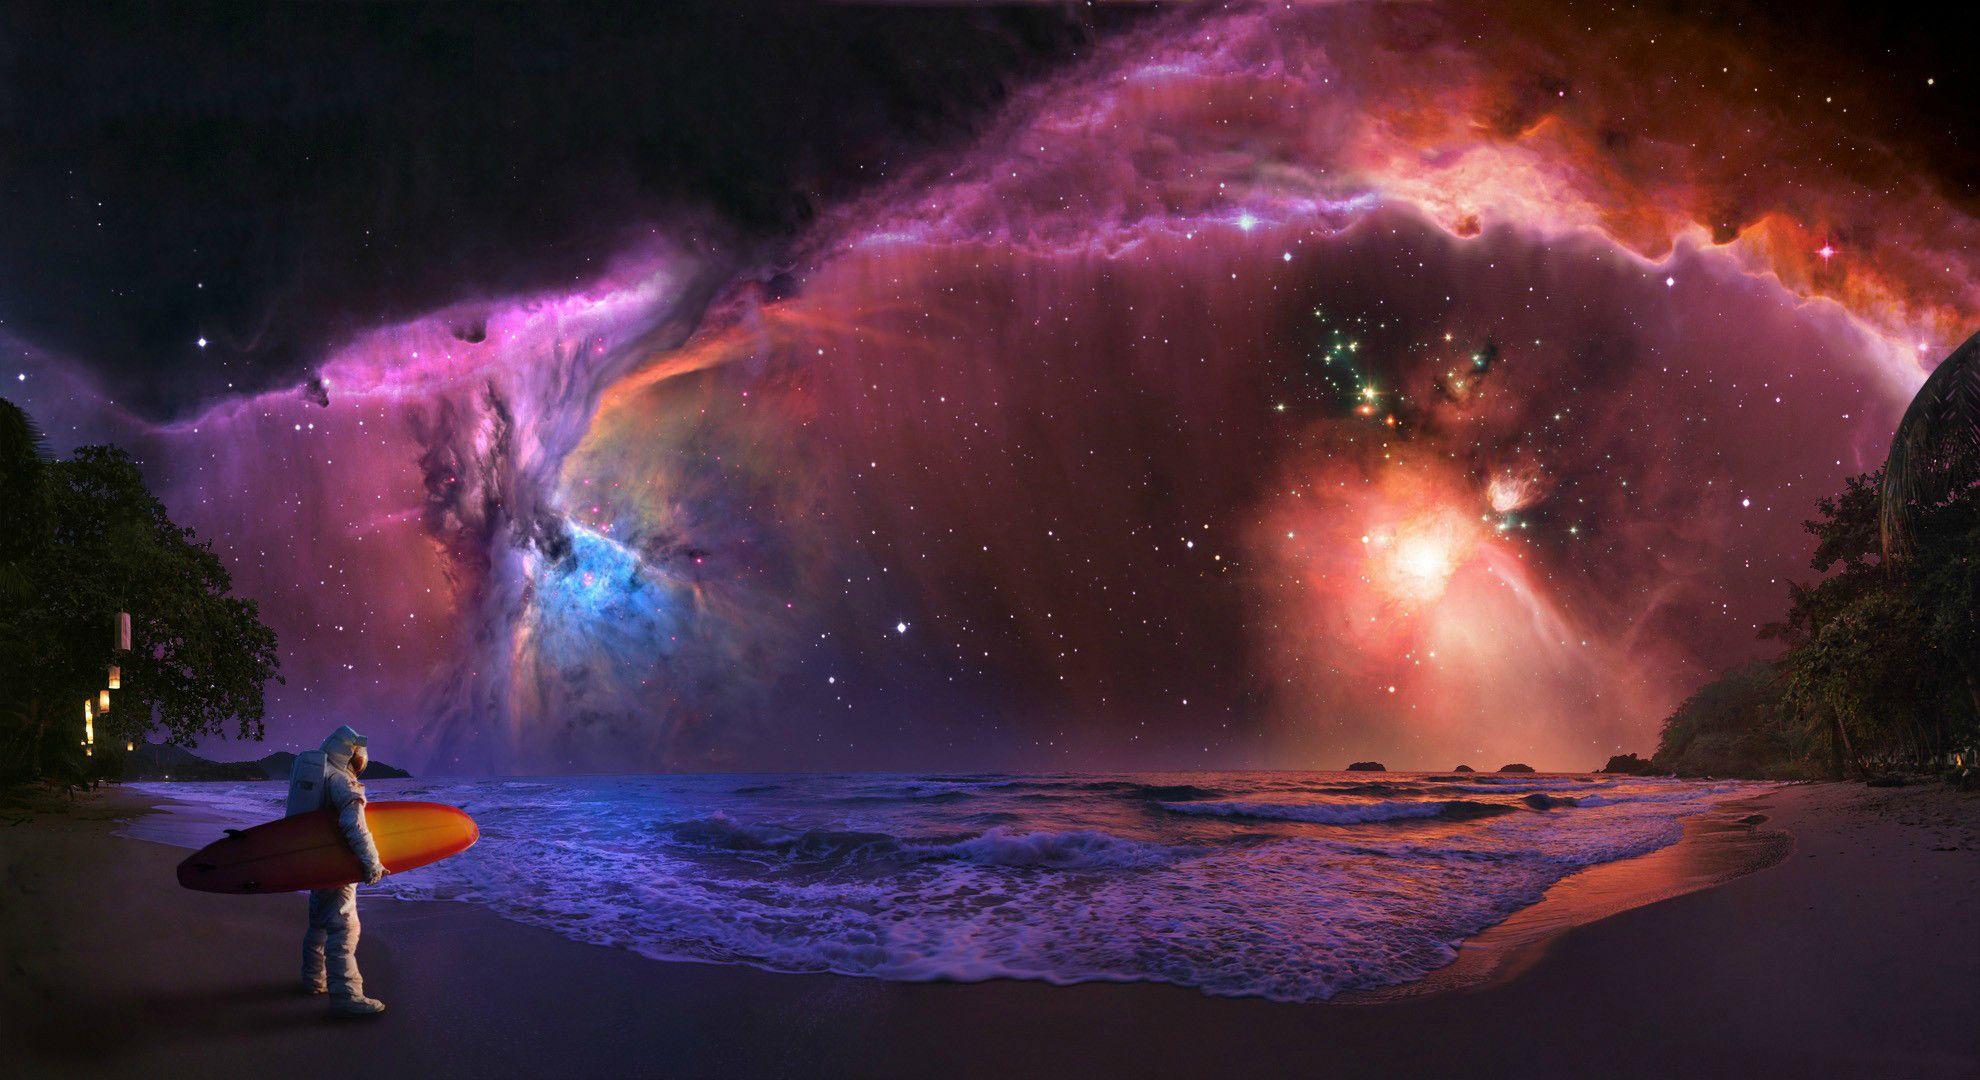 Astronaut Surfer 1980x1080 Nebula Wallpaper Hd Galaxy Wallpaper Galaxy Wallpaper